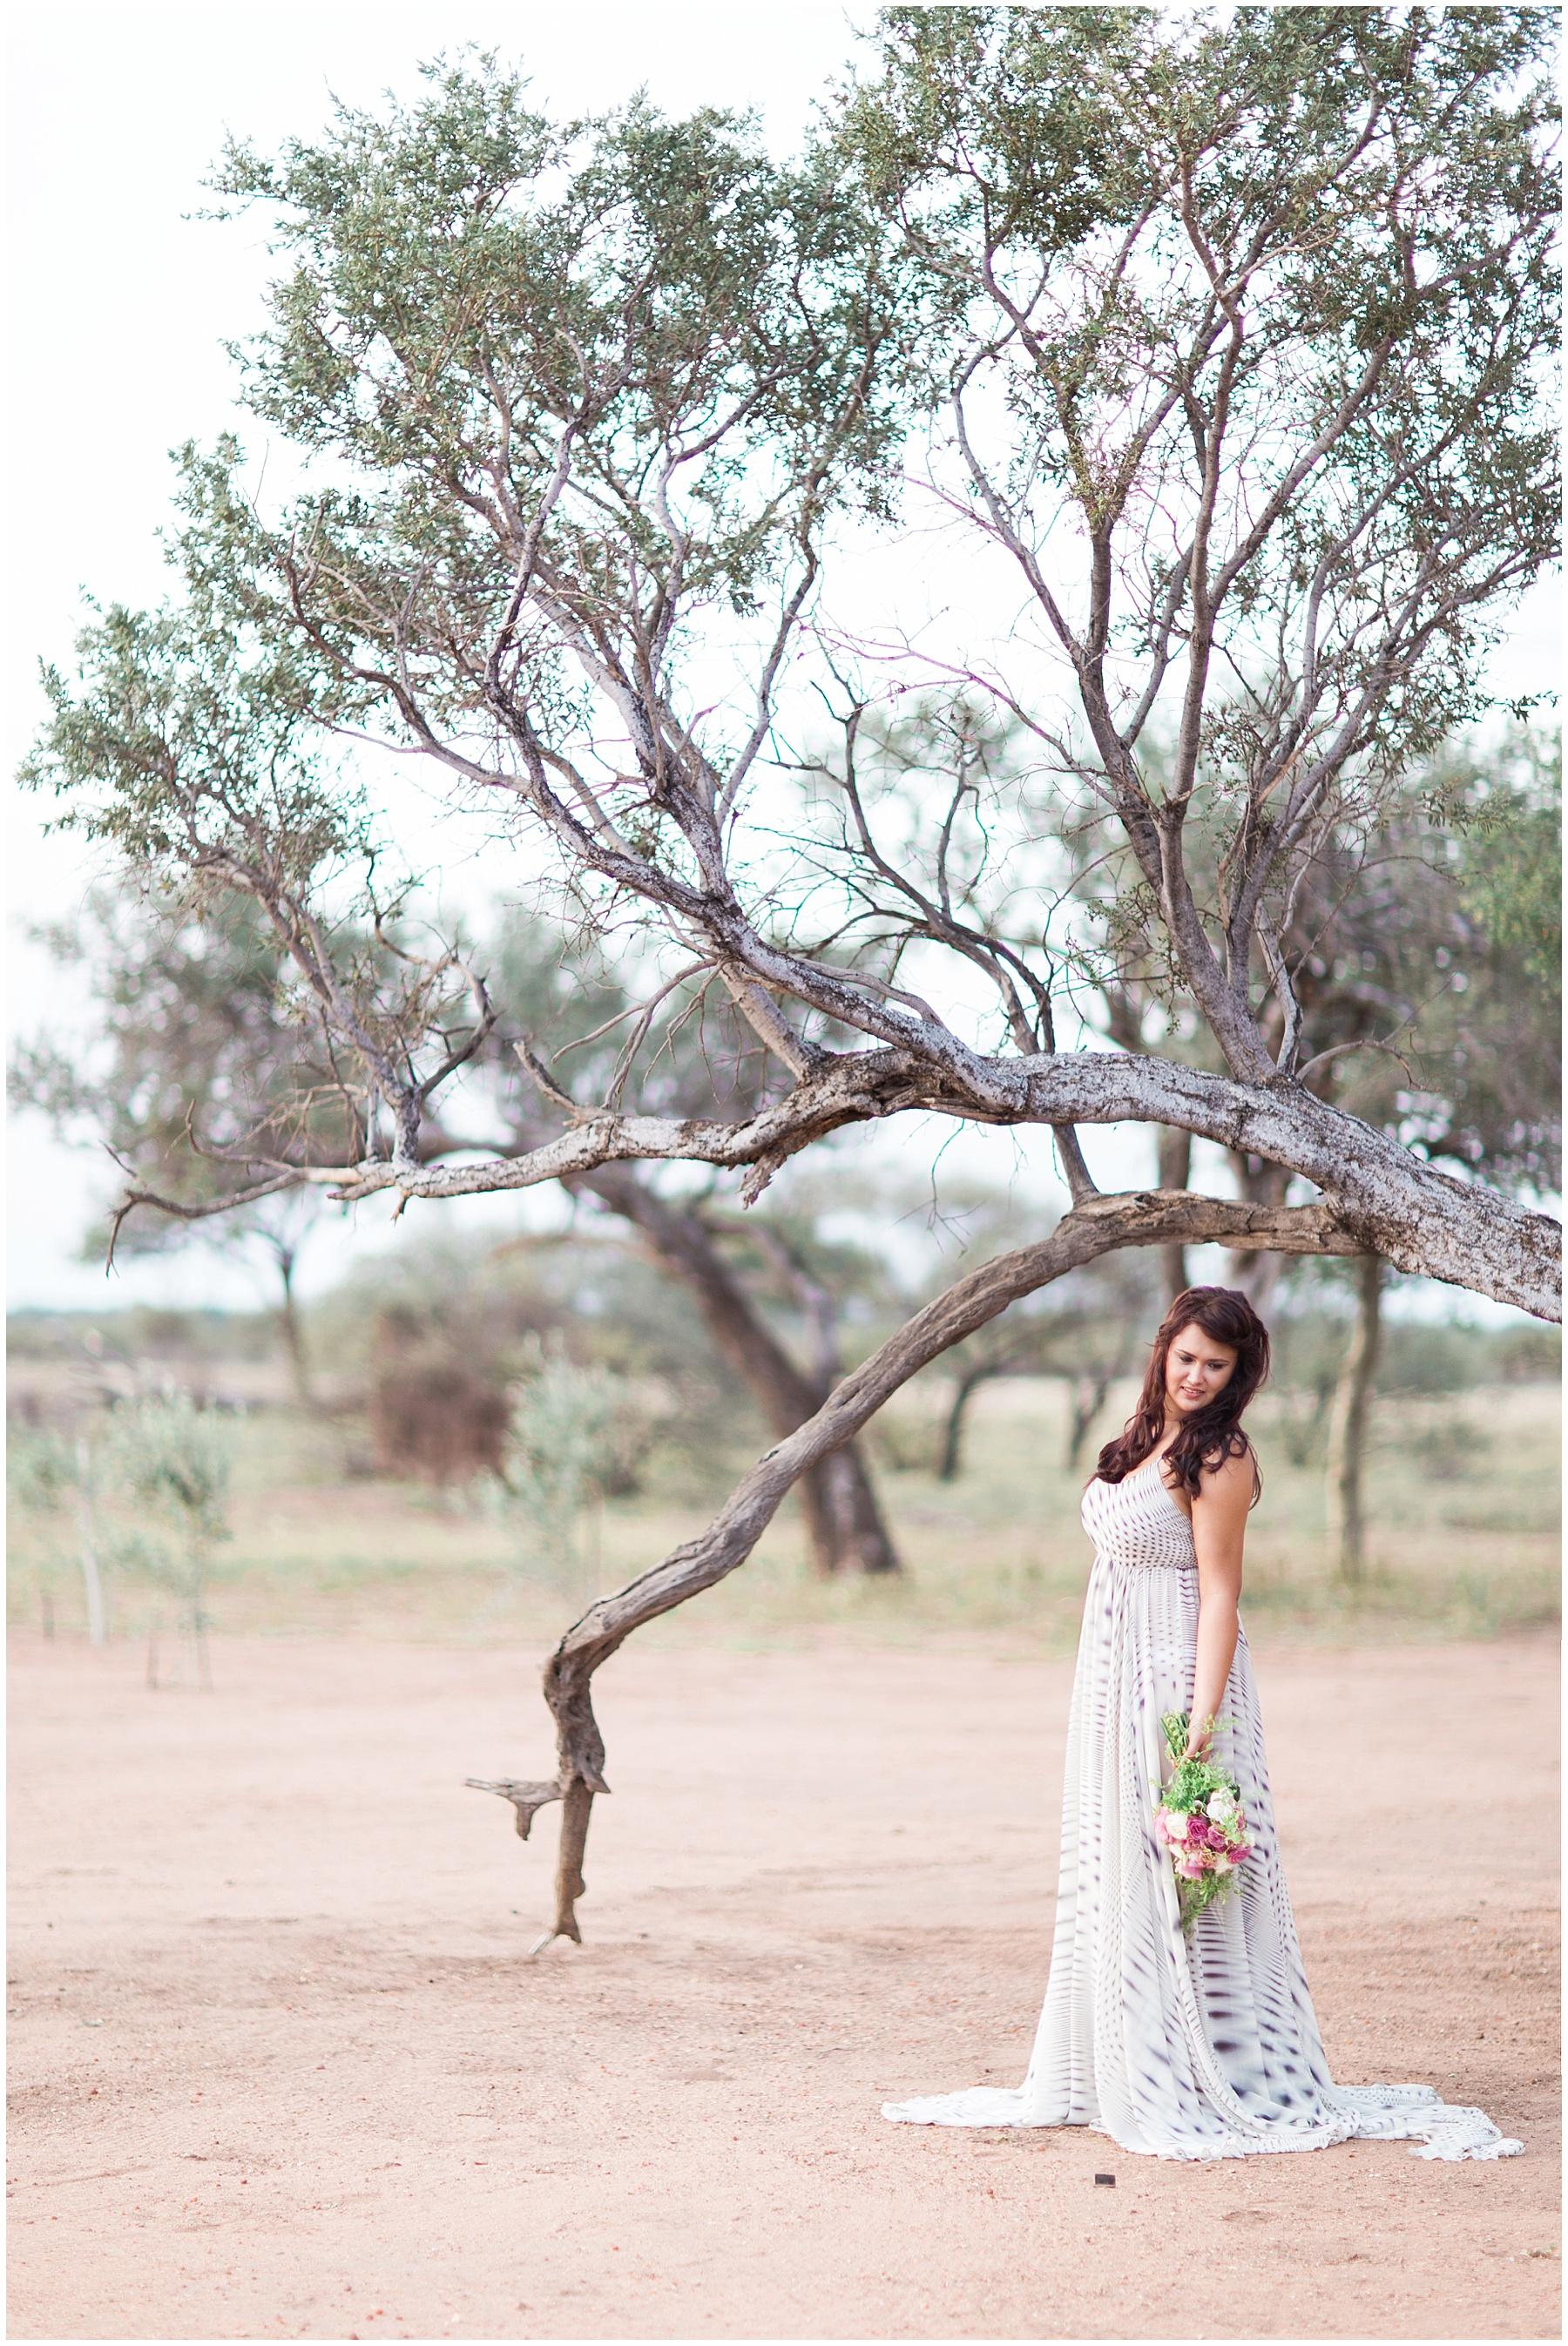 AliciaLandman_JoleneandZander_Wedding_The Pretty Blog_0410.jpg